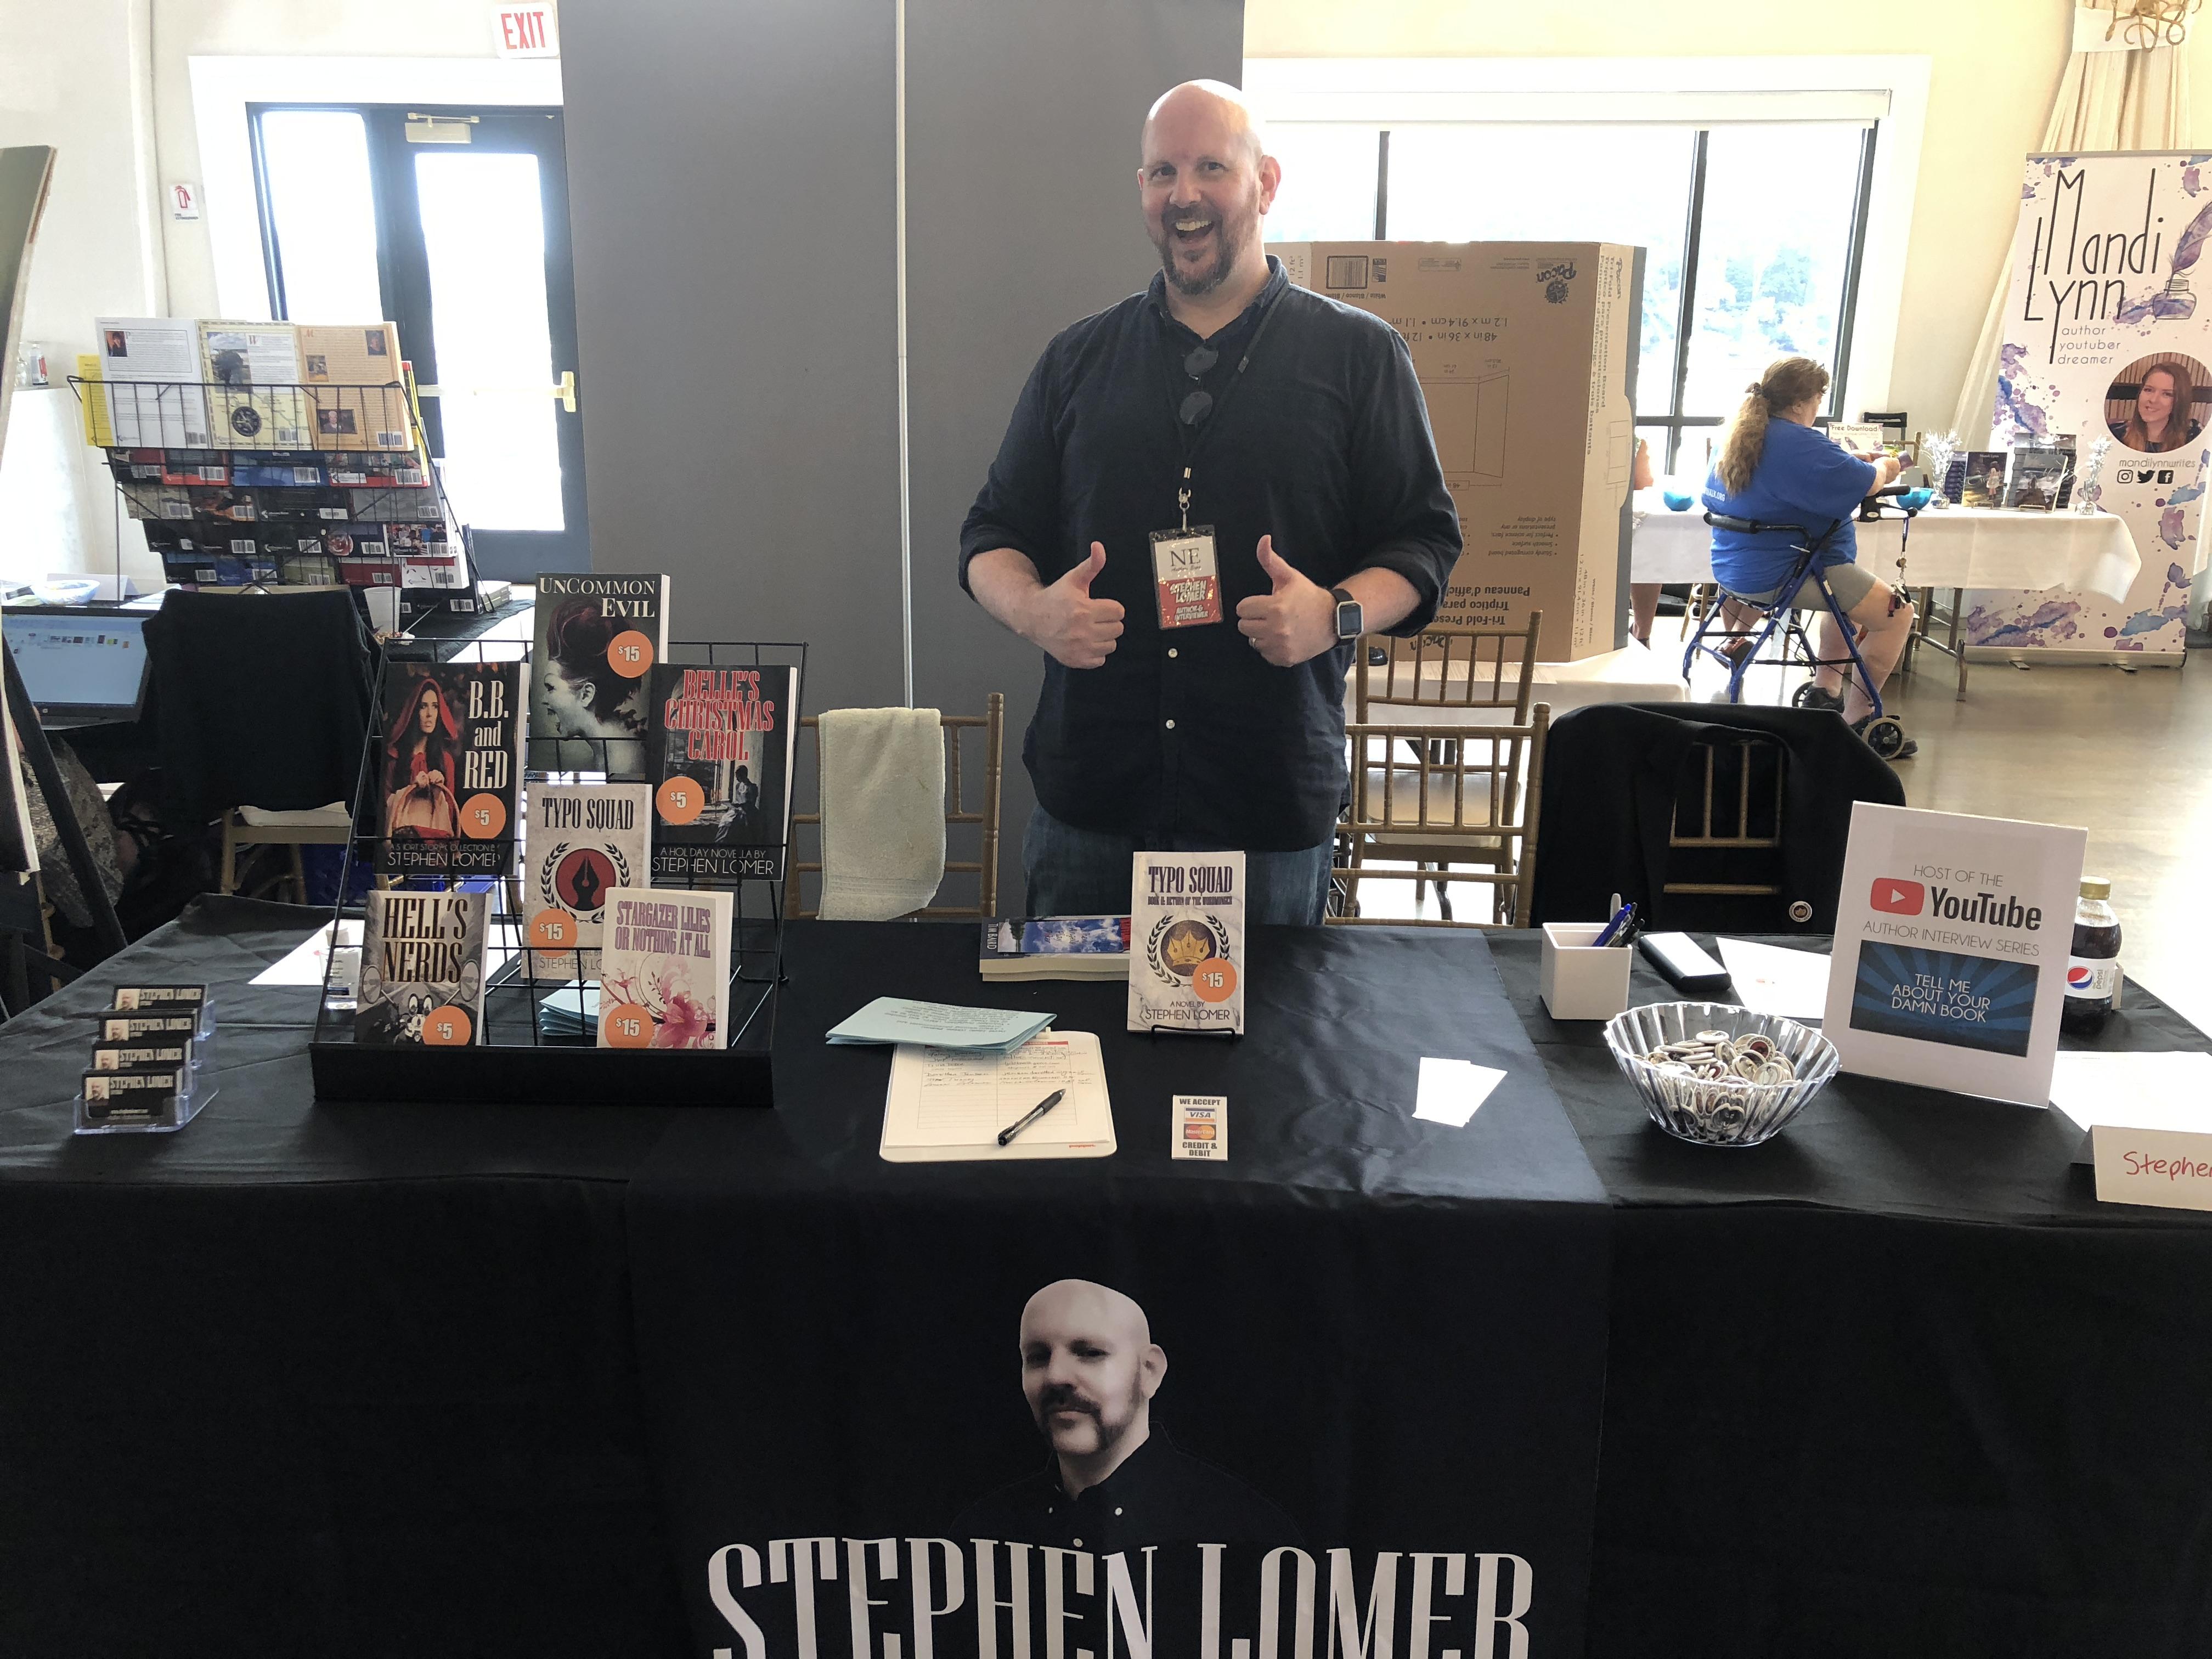 Author Stephen Lomer (http://www.stephenlomer.com/).